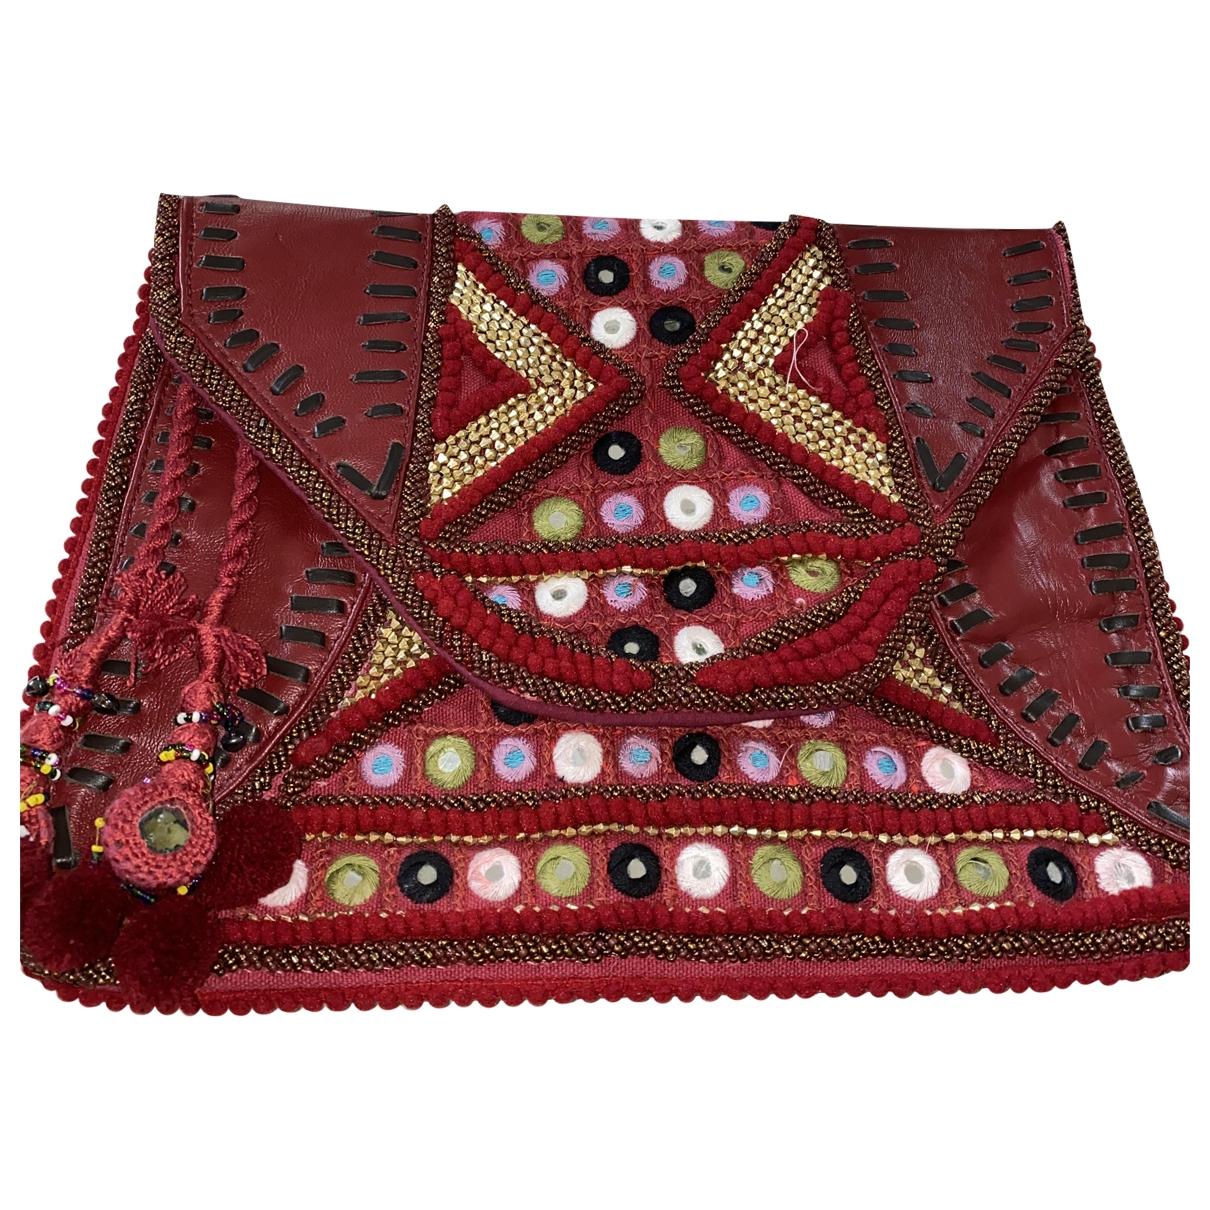 Antik Batik \N Burgundy Leather Clutch bag for Women \N